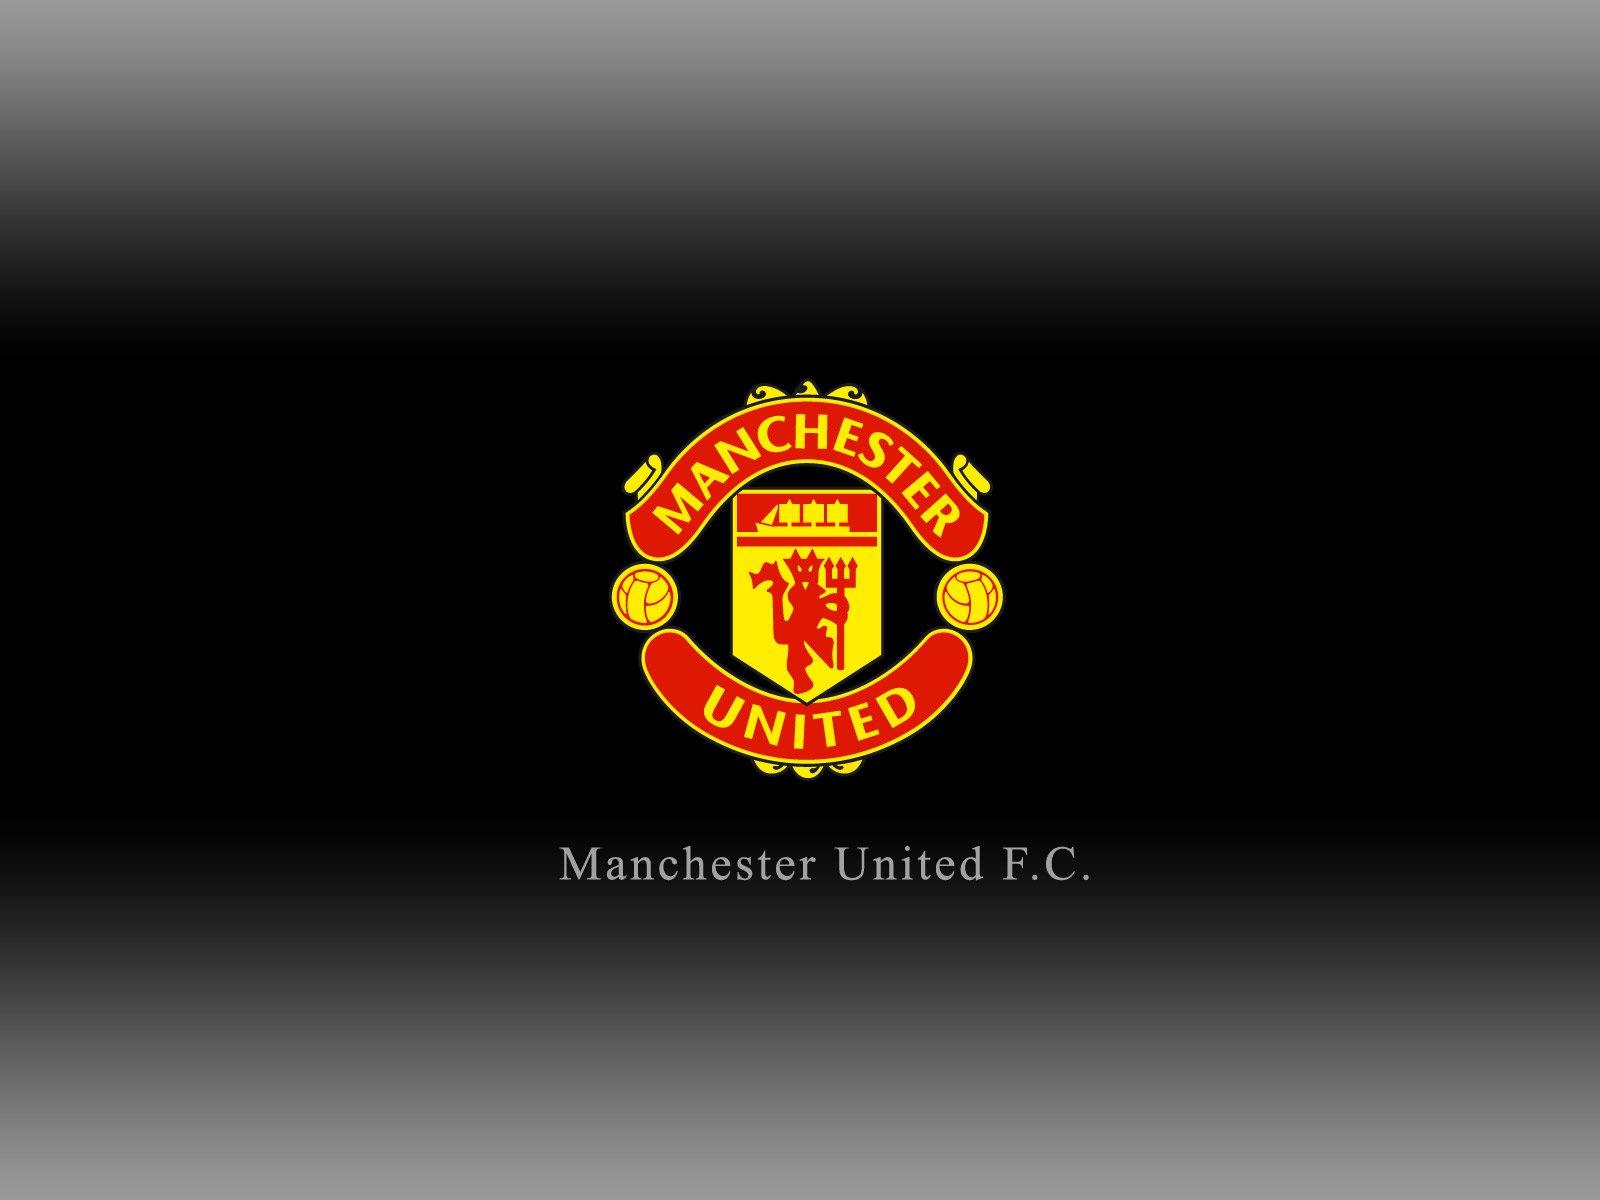 manchester united fc wallpaper man united malaysia no 1 fan